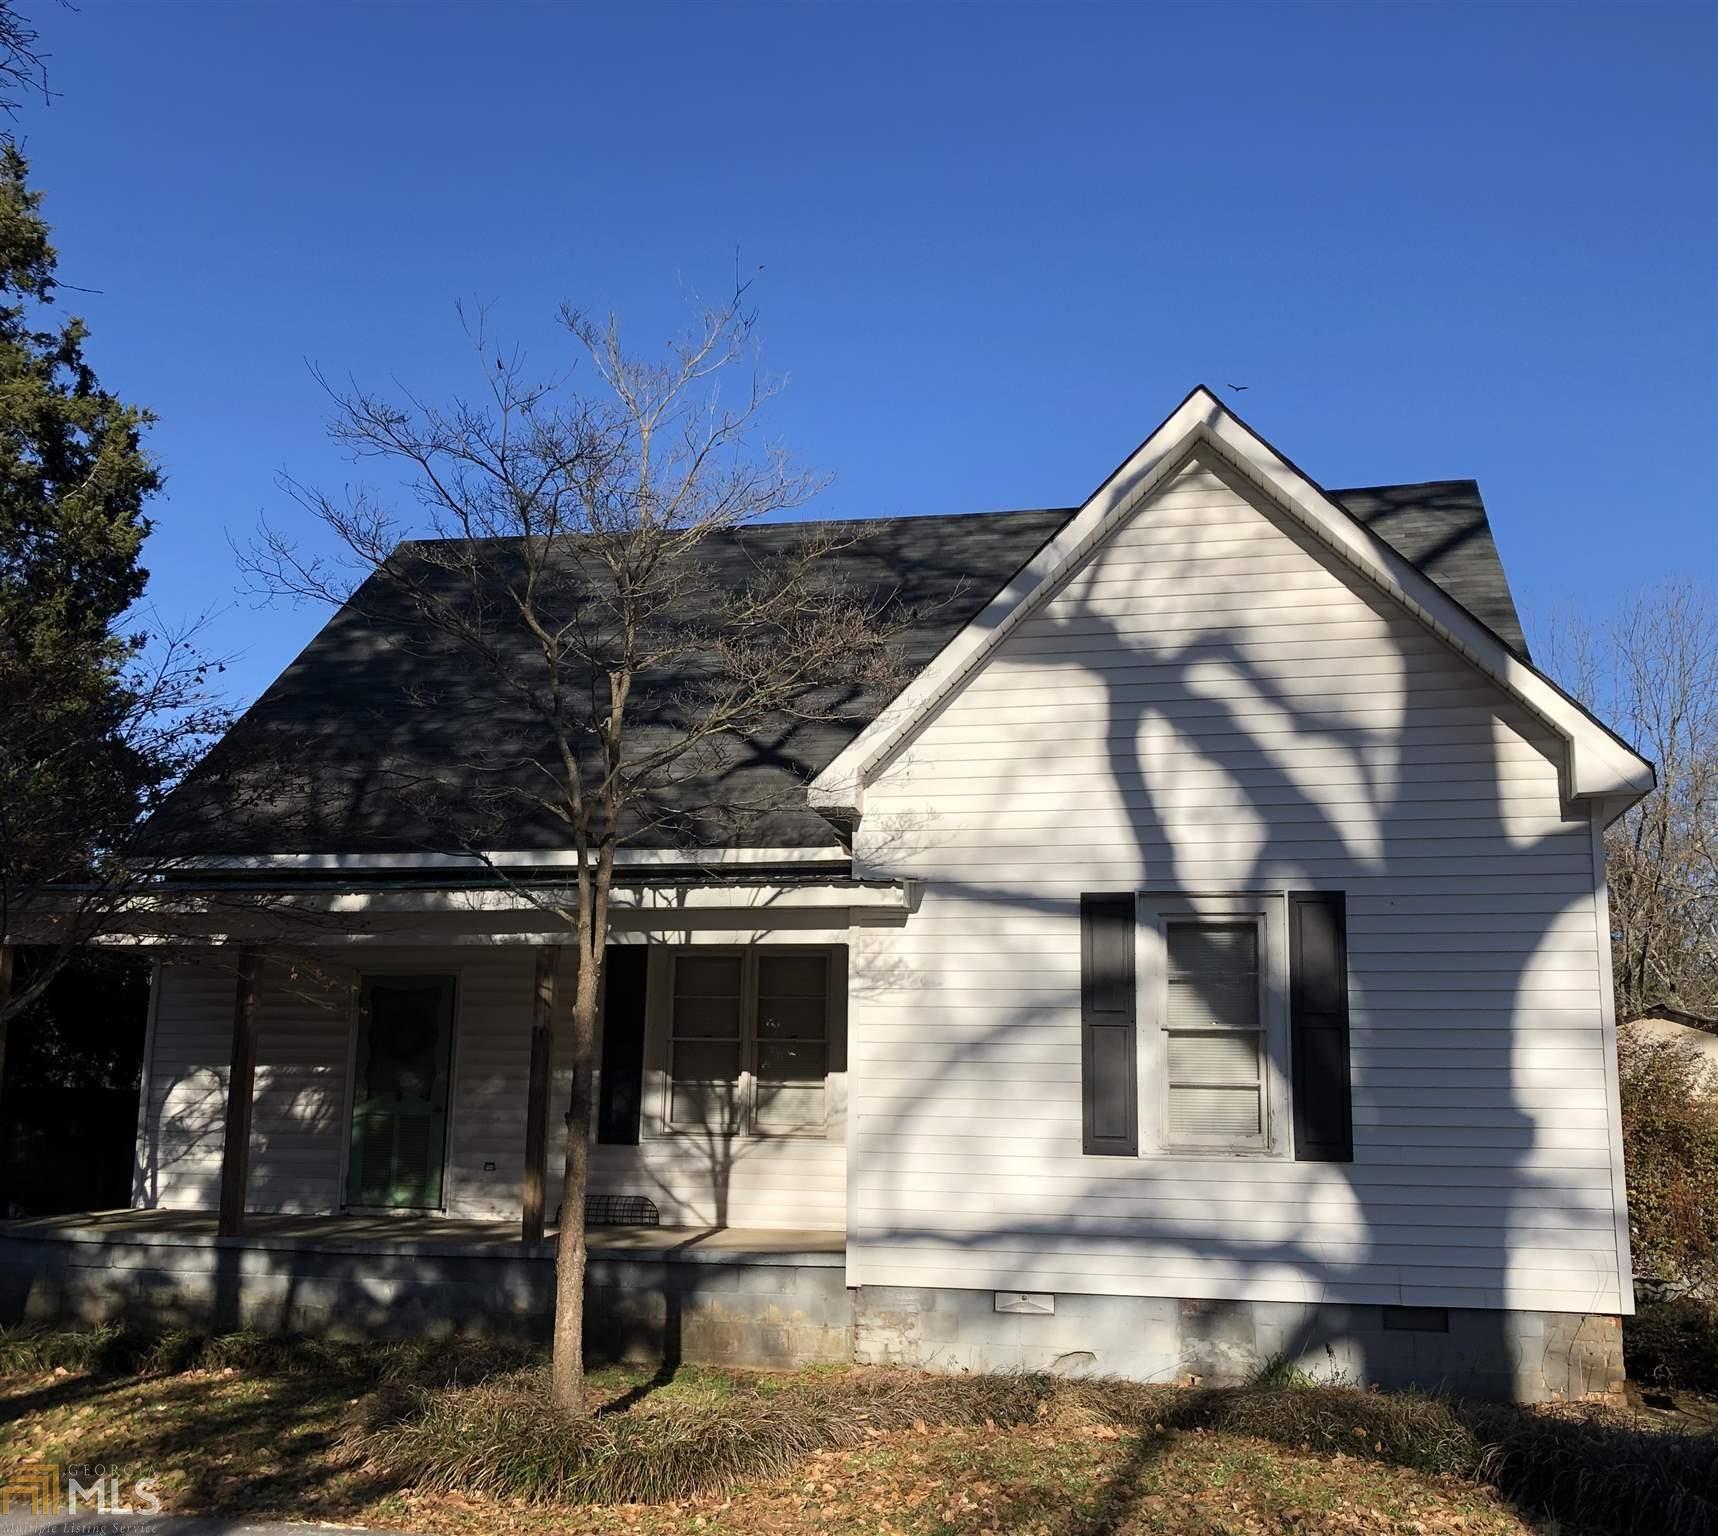 Photo of 6193 Collins St, Covington, GA 30014 (MLS # 8928260)